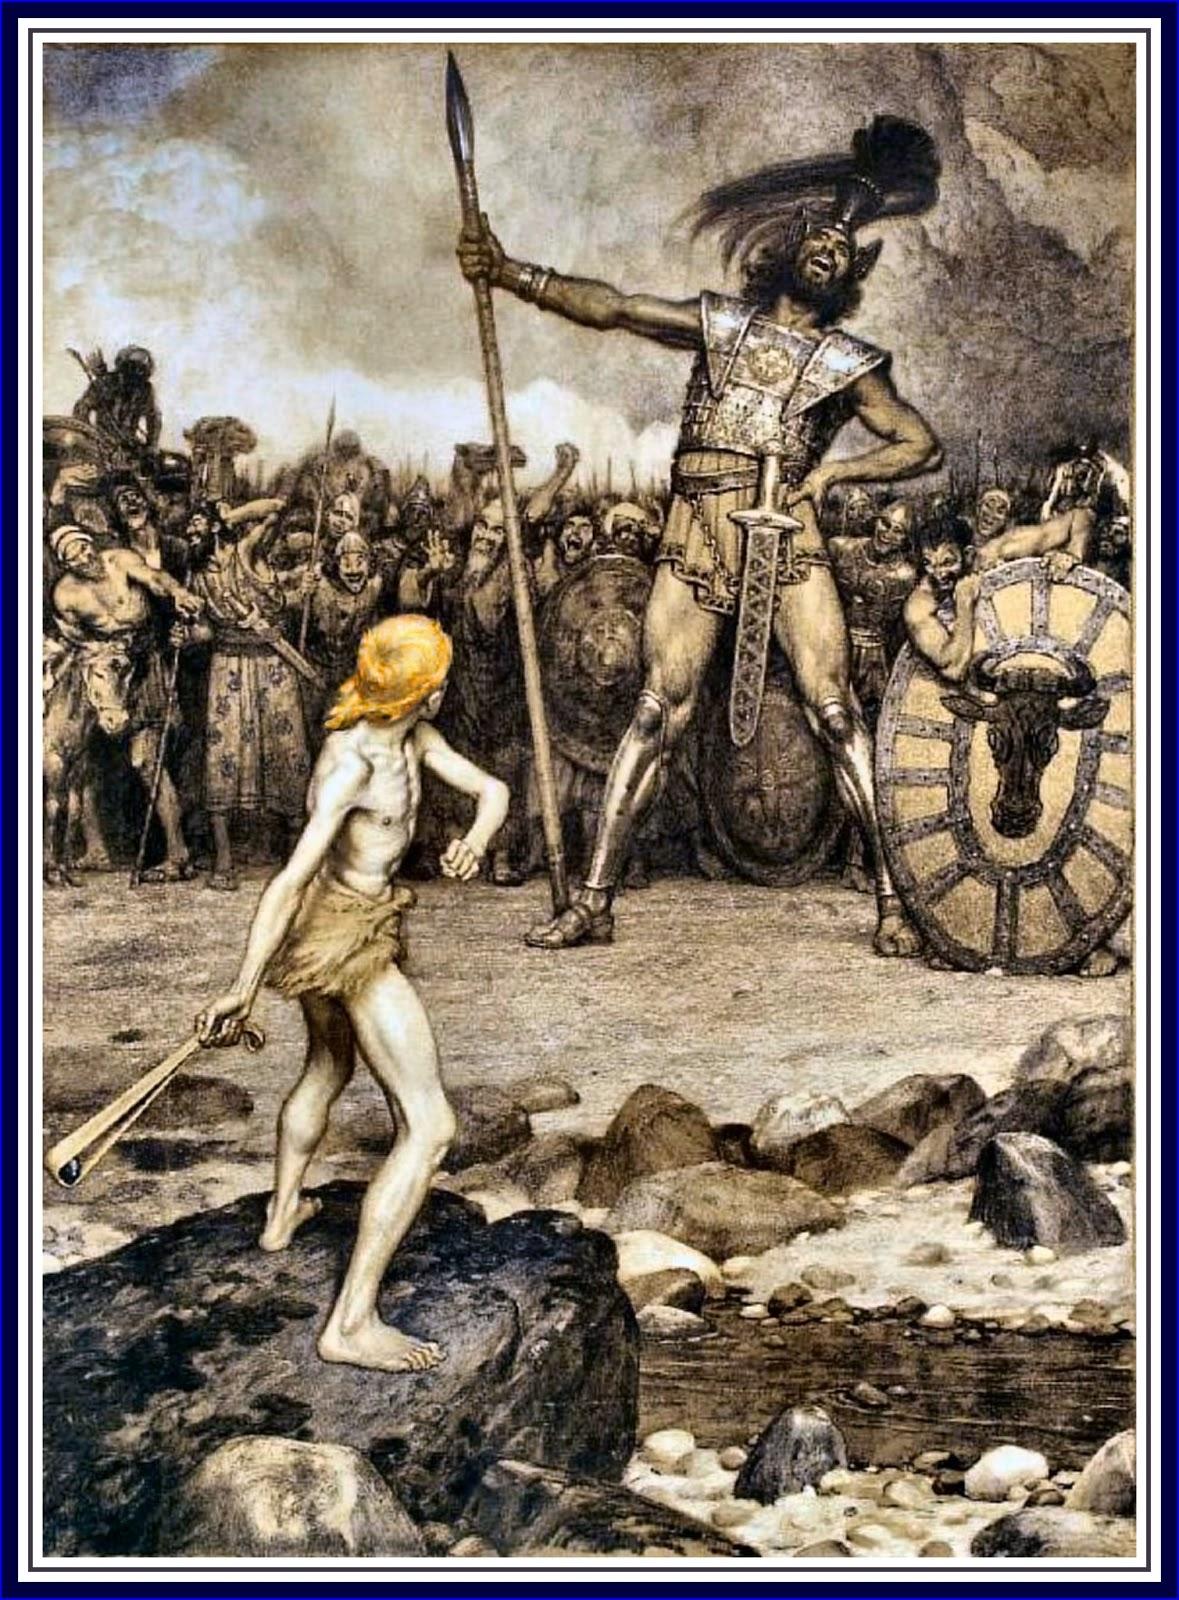 """David und Goliath"" by Osmar Schindler, 1888 (Public domain via Wikimedia Commons)"